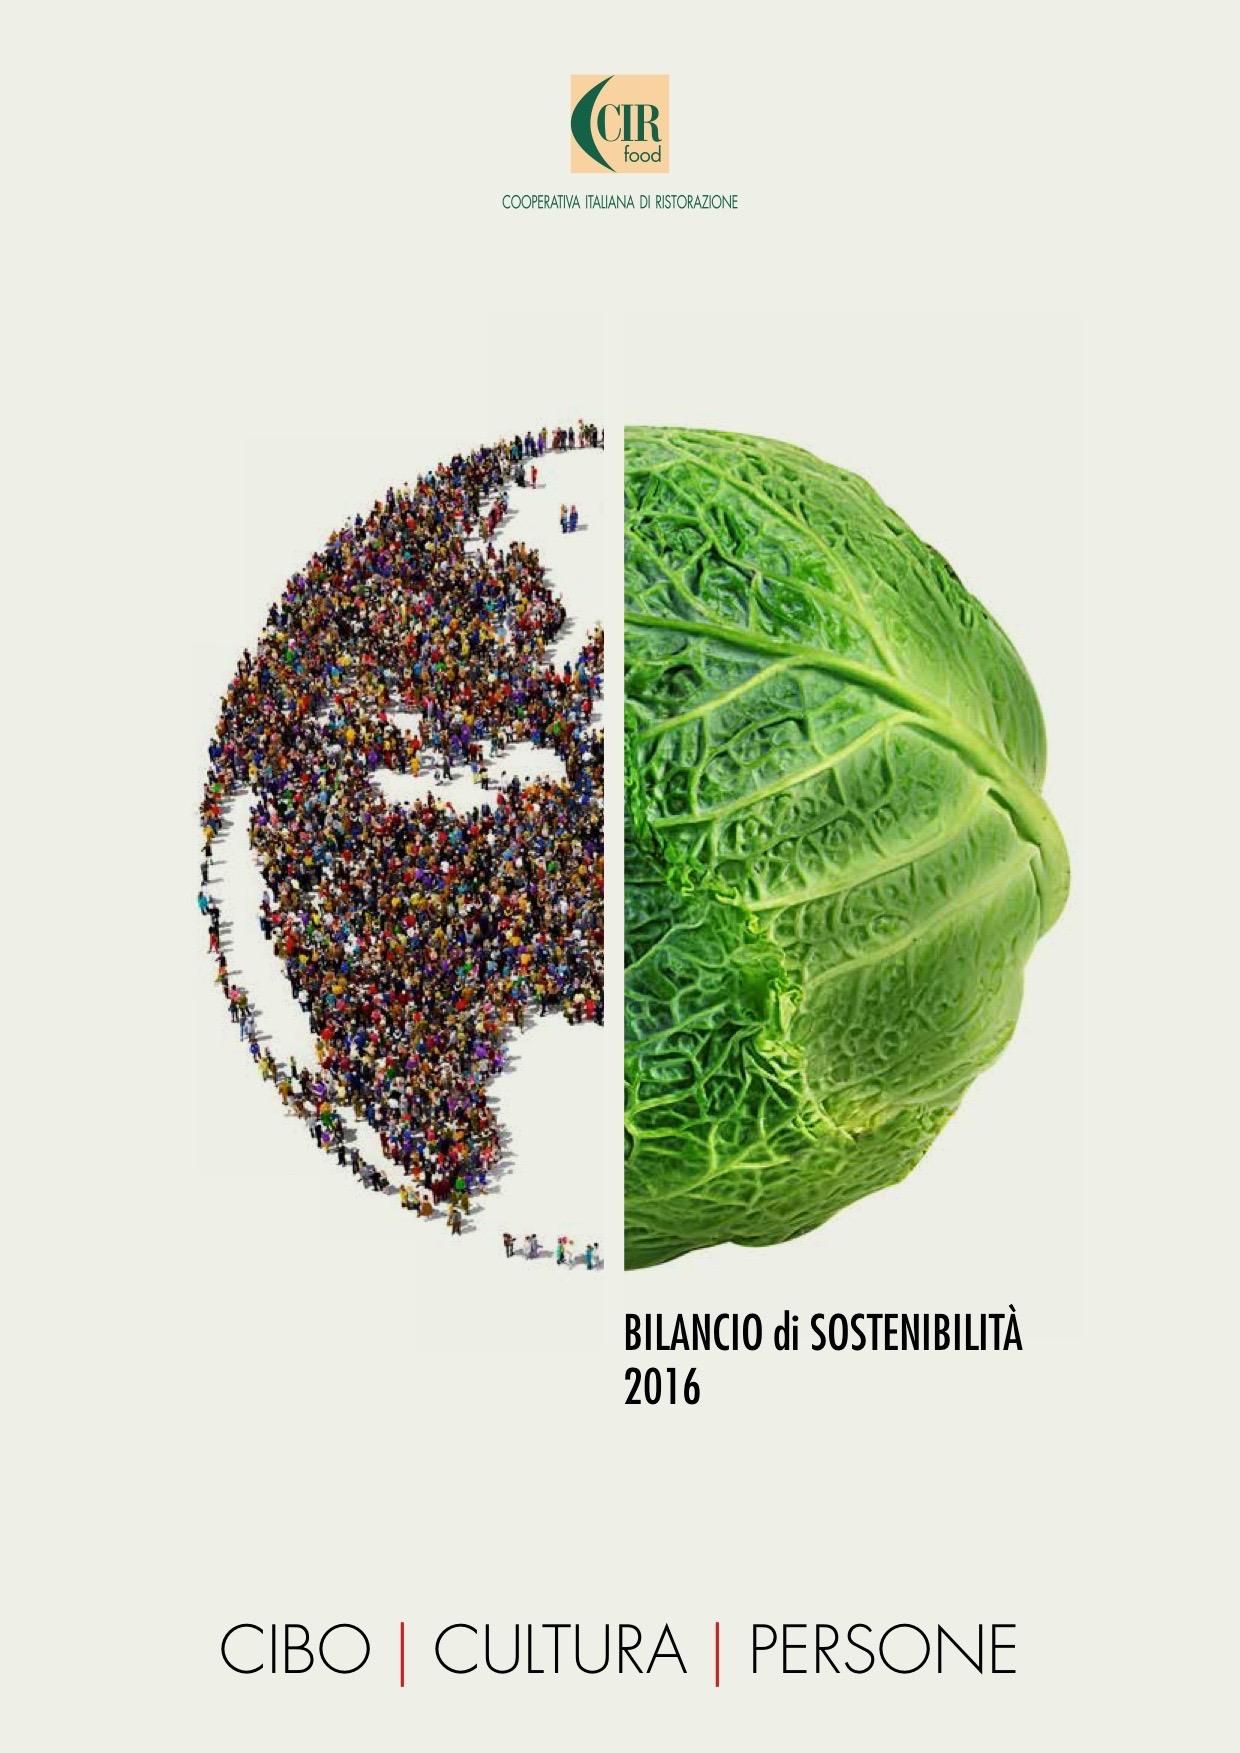 CIR FOOD riceve il Premio Biblioteca Bilancio Sociale 2017